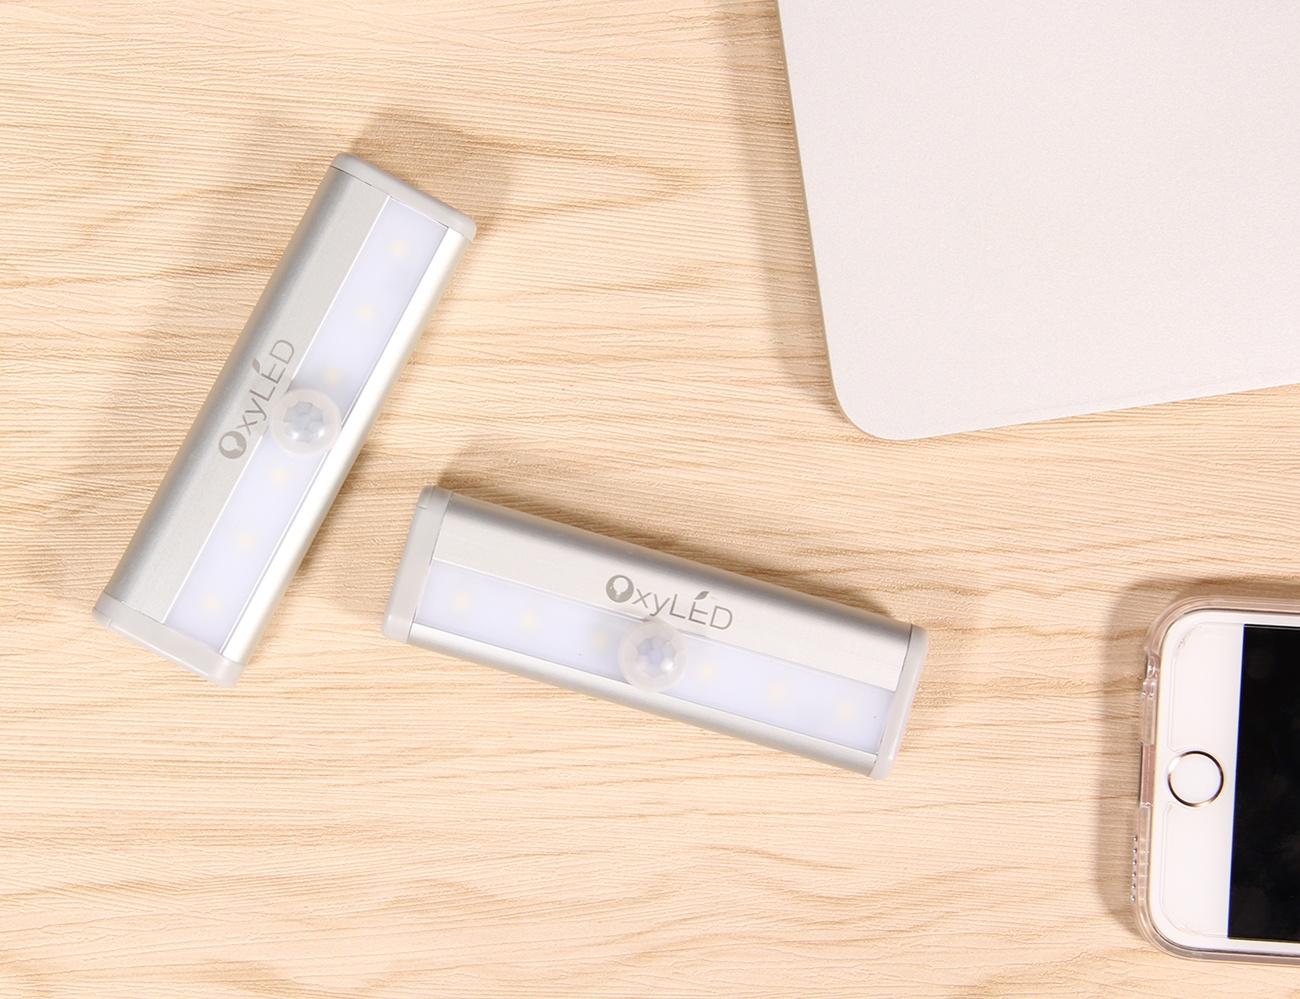 OxySense Motion Activated Mini LED Light